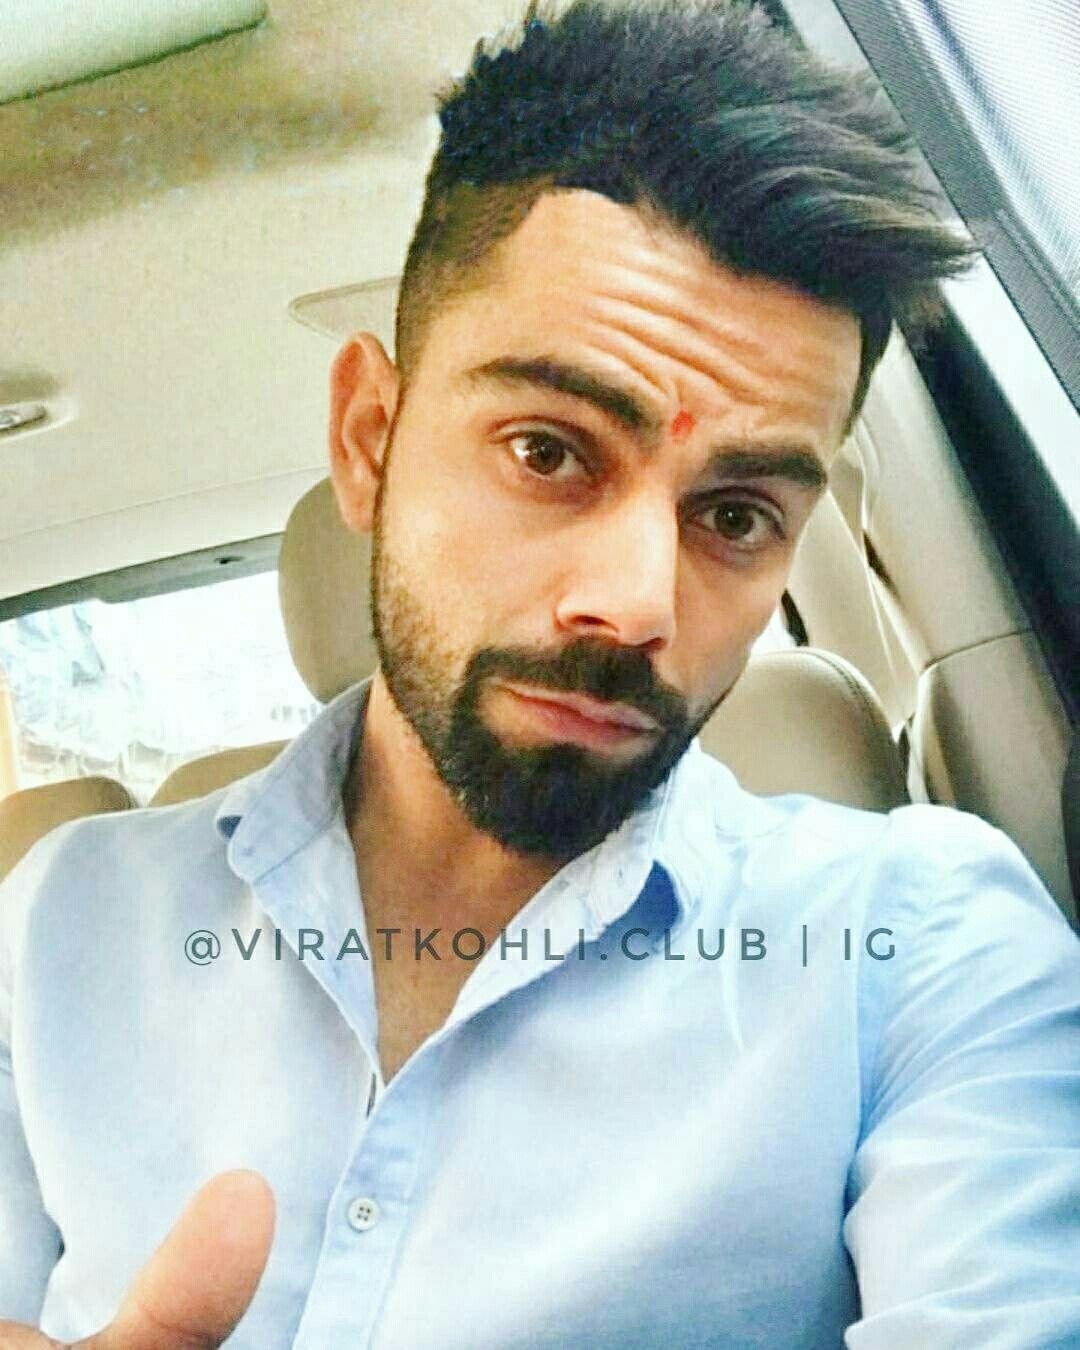 Virat hairstyle boy krishna kishore jalwaniya kjalwaniya on pinterest